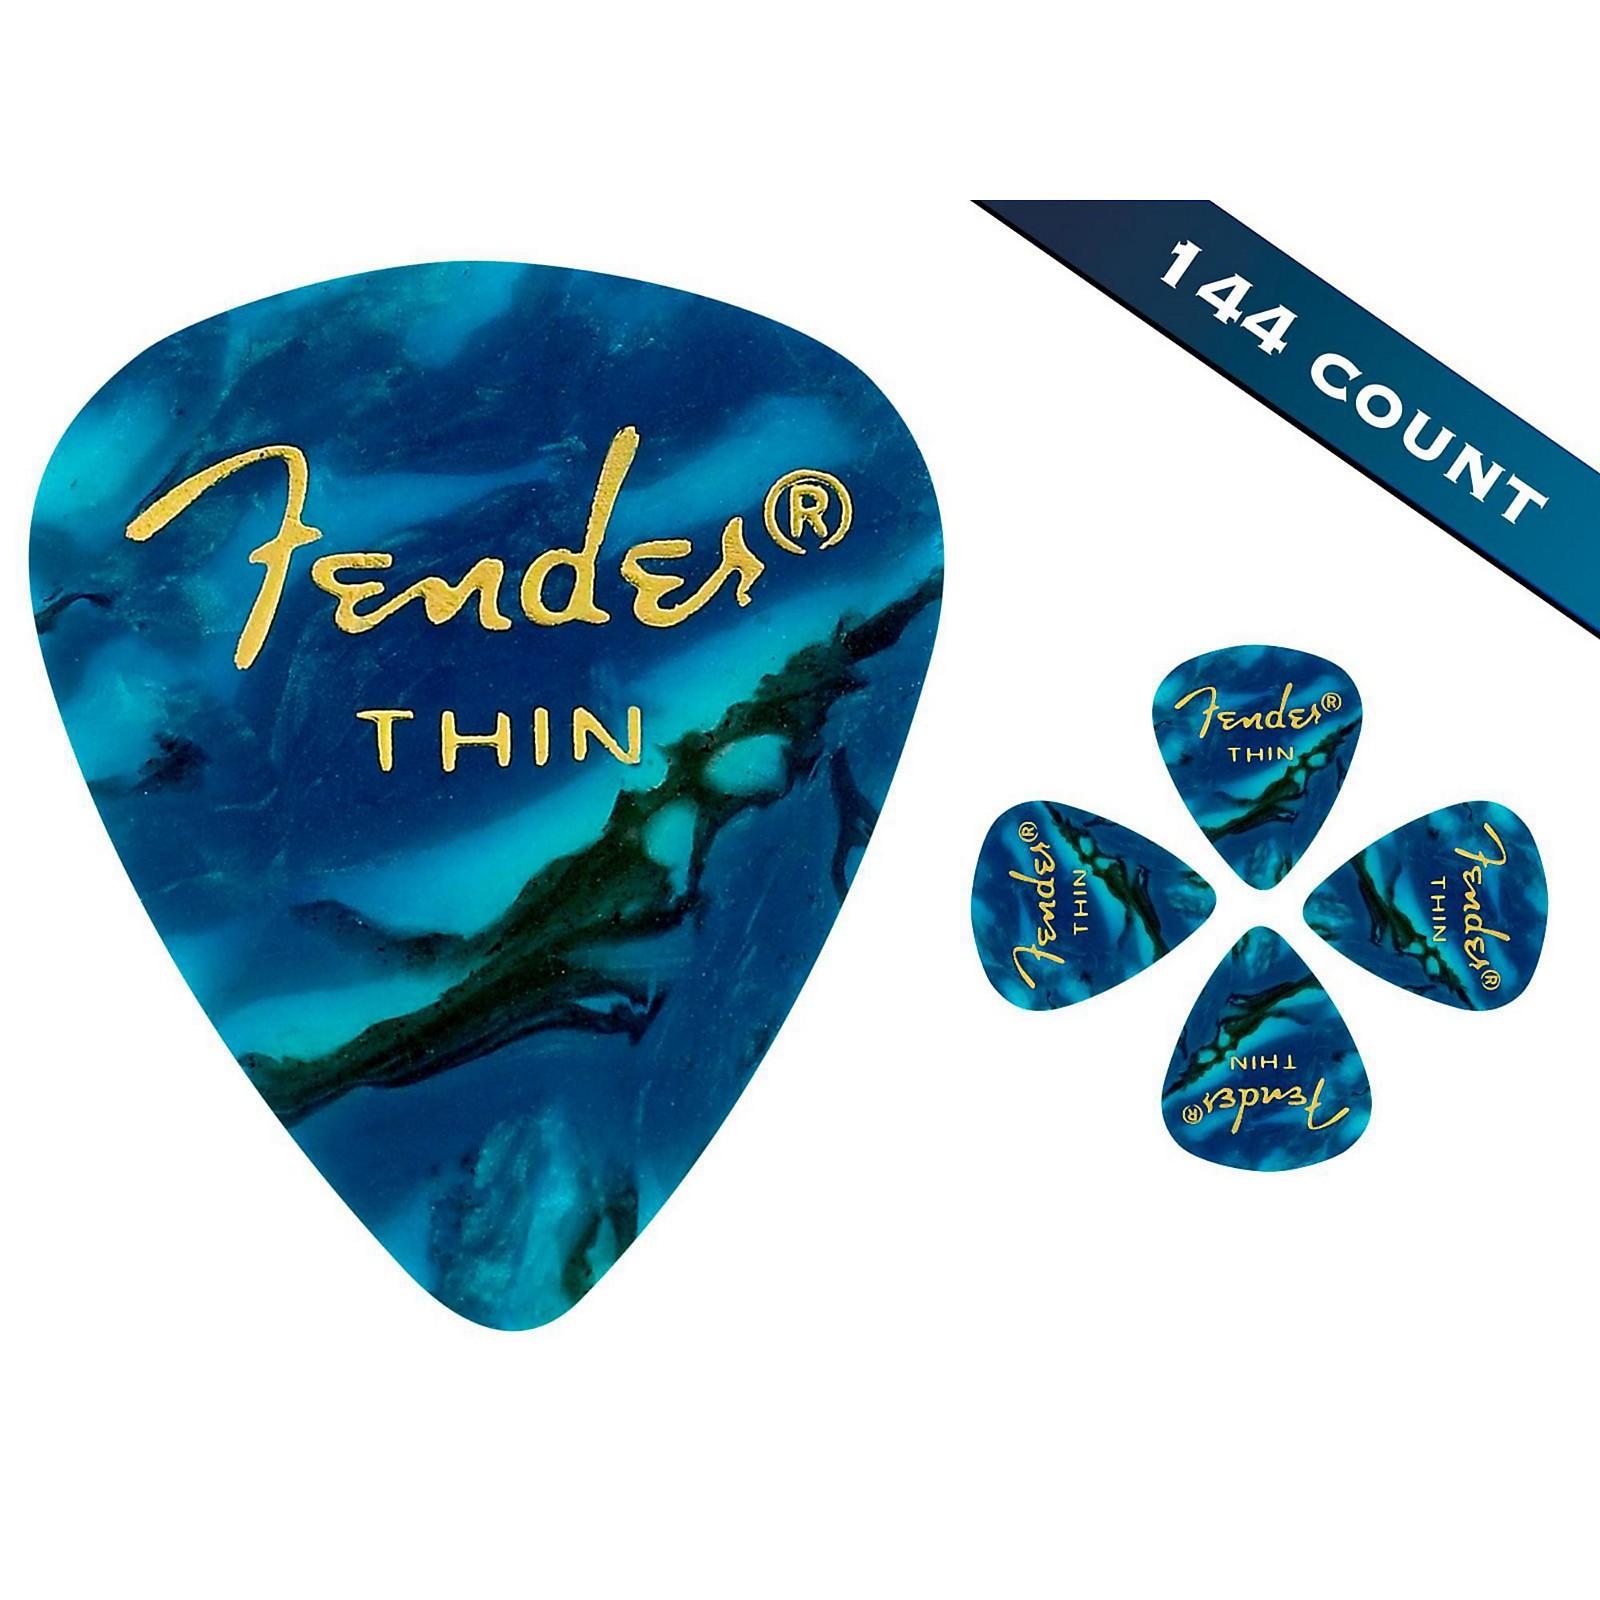 Fender 351 Premium Celluloid Guitar Picks BLUE MOTO 1 Gross THIN 144-Pack